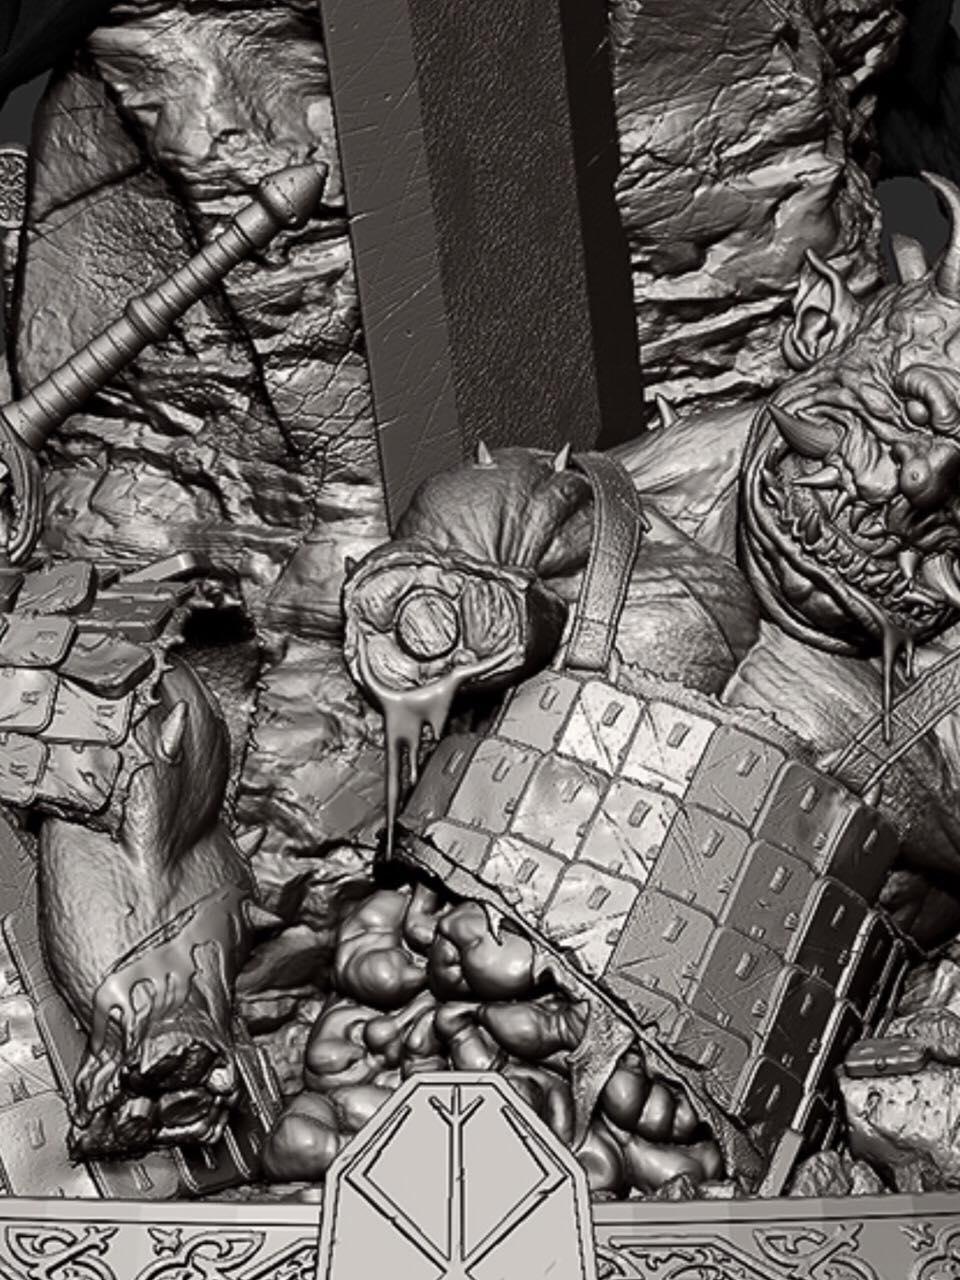 Link a berserk – guts – berserker armor – primi teaser – 2